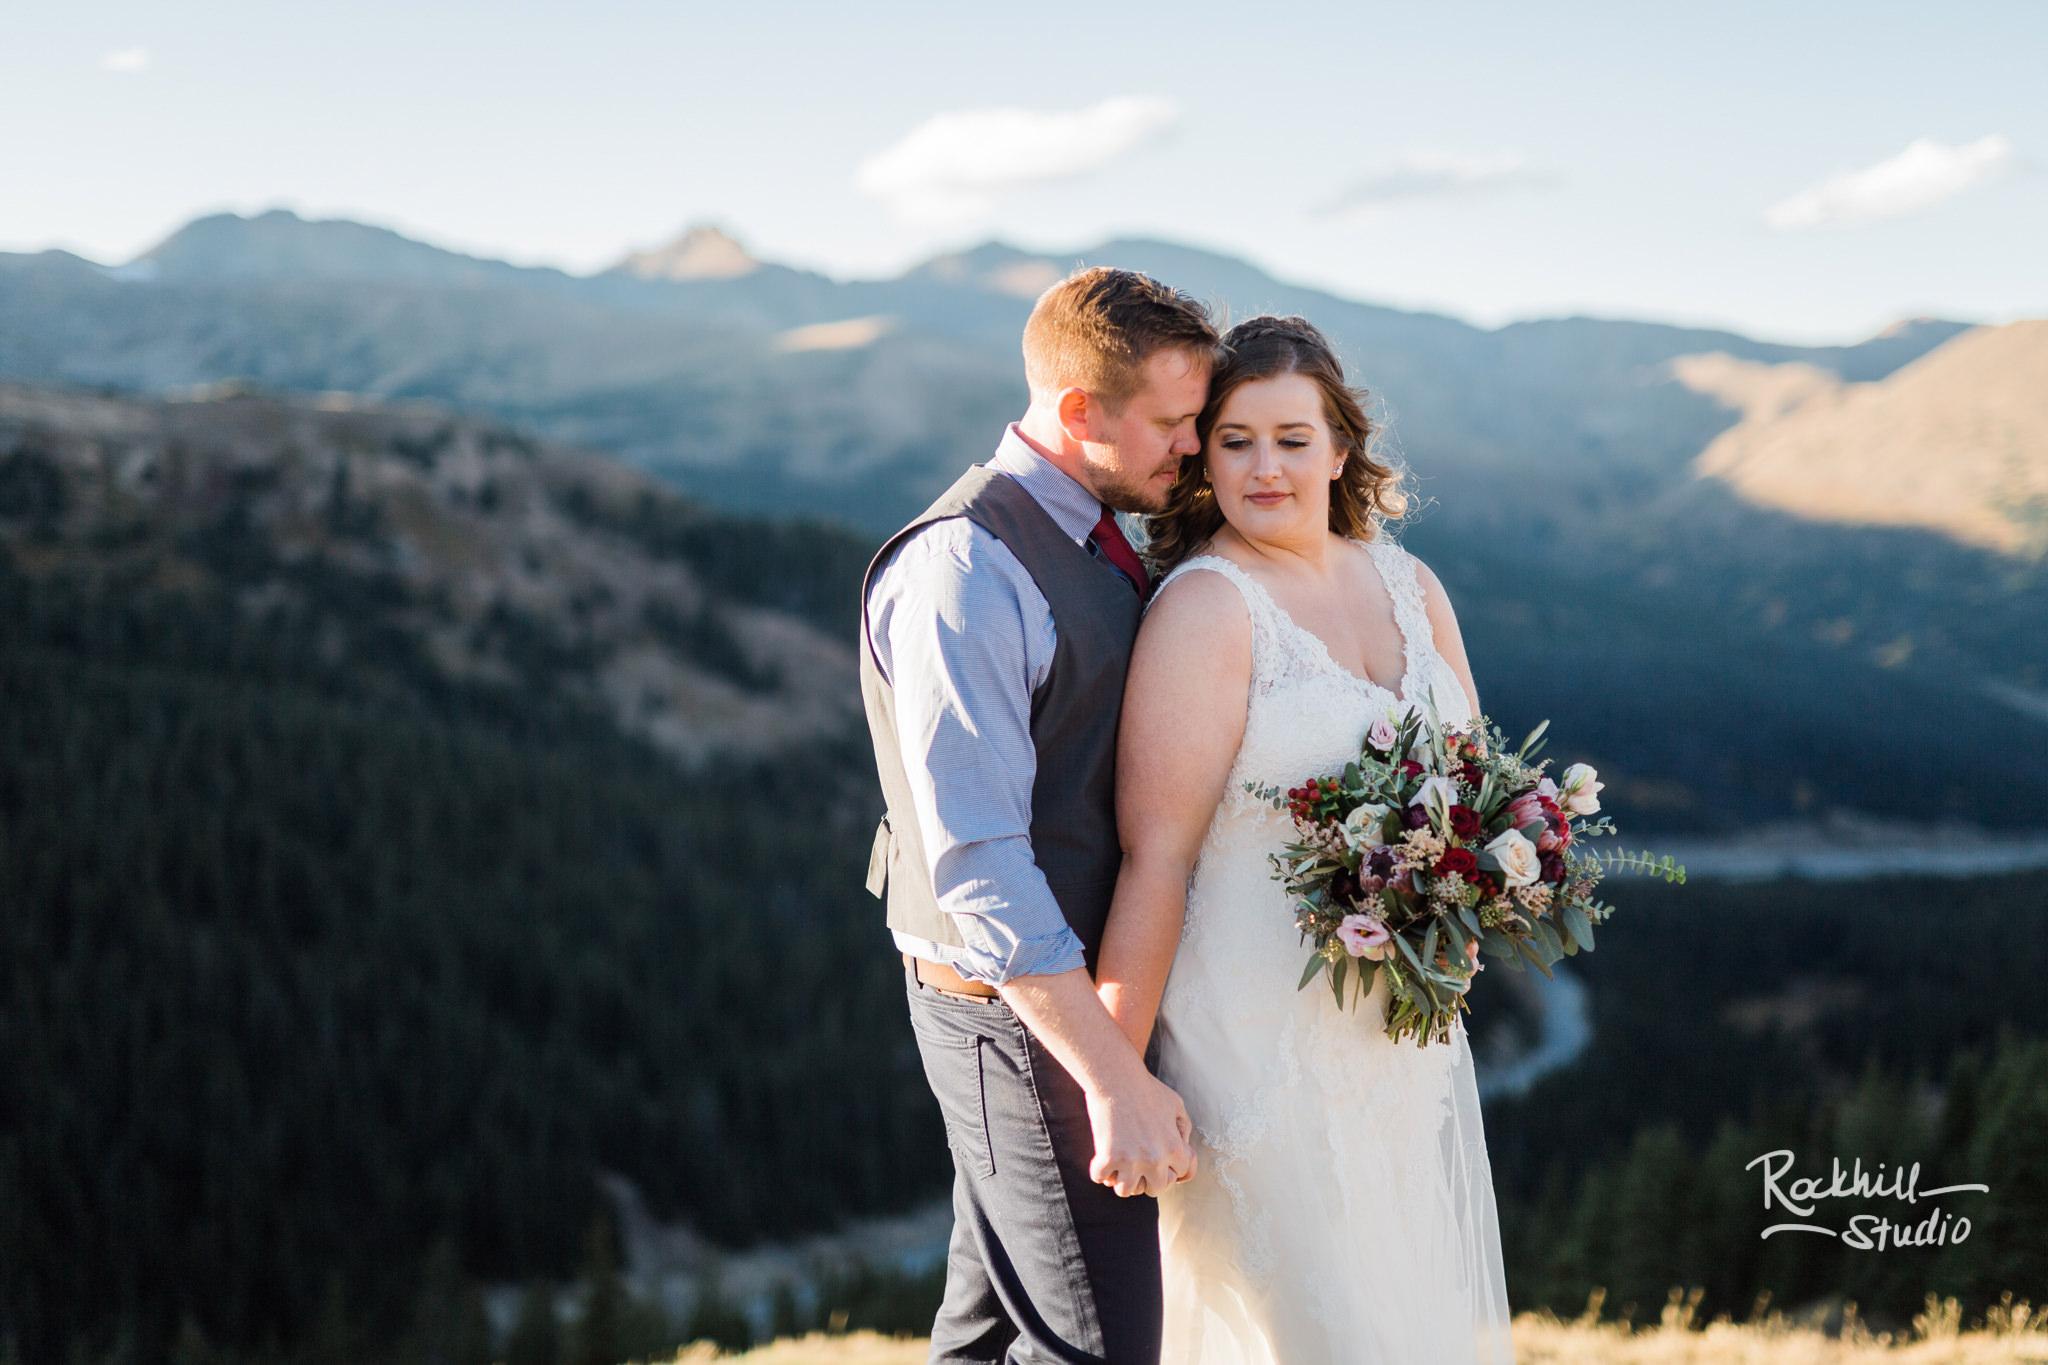 Destination wedding photographer Rockhill Studio, Loveland Pass, Traverse City to Breckenridge, Colorado